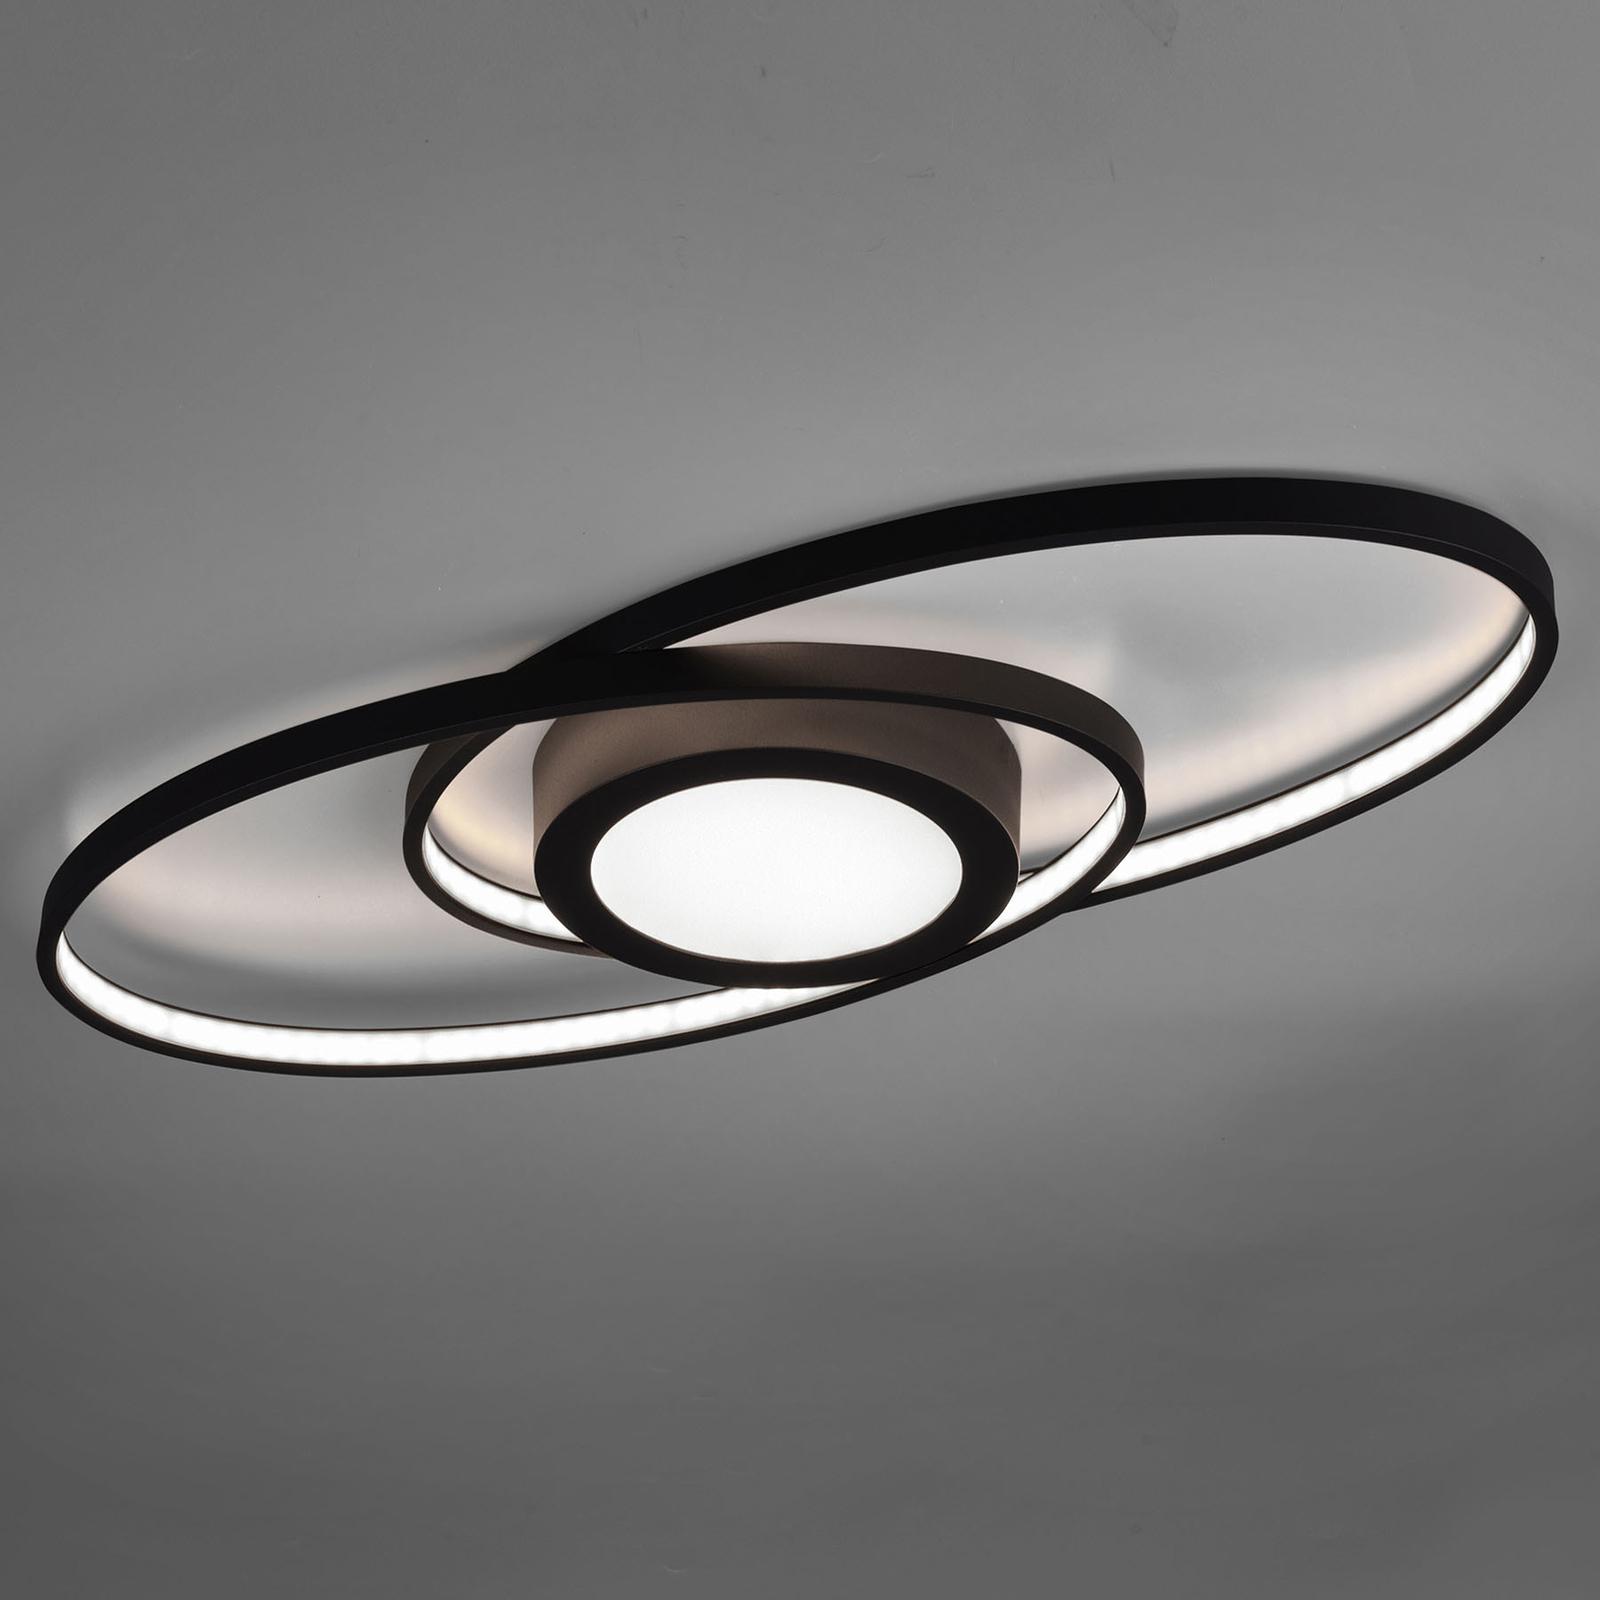 LED-taklampe Galaxy, dimbar, antrasitt